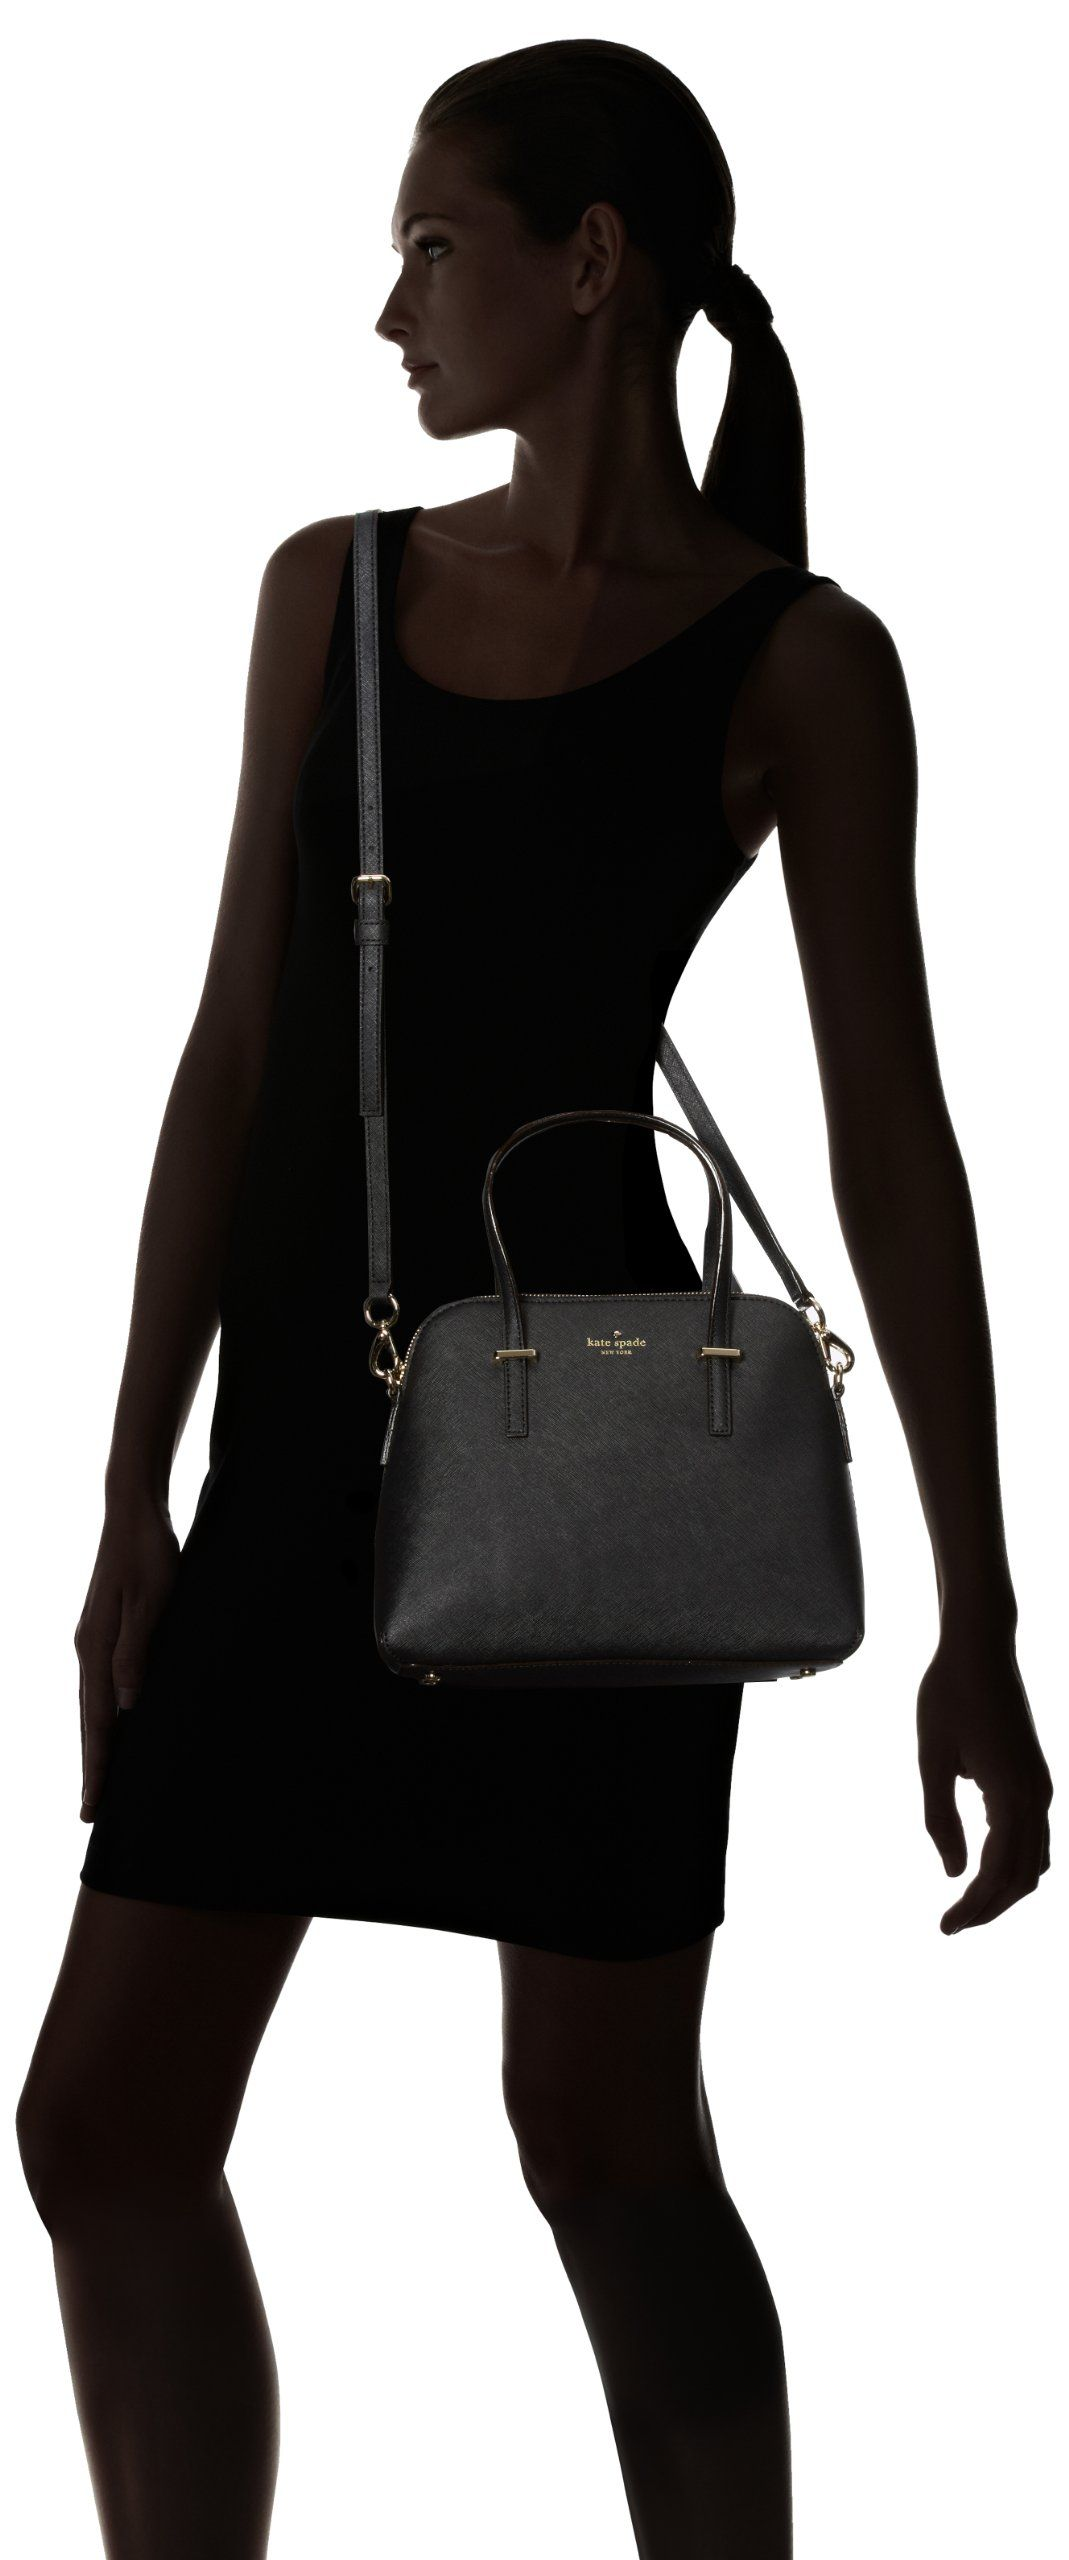 kate spade new york Maise PXRU4470 Tote Handbag,Black,One Size